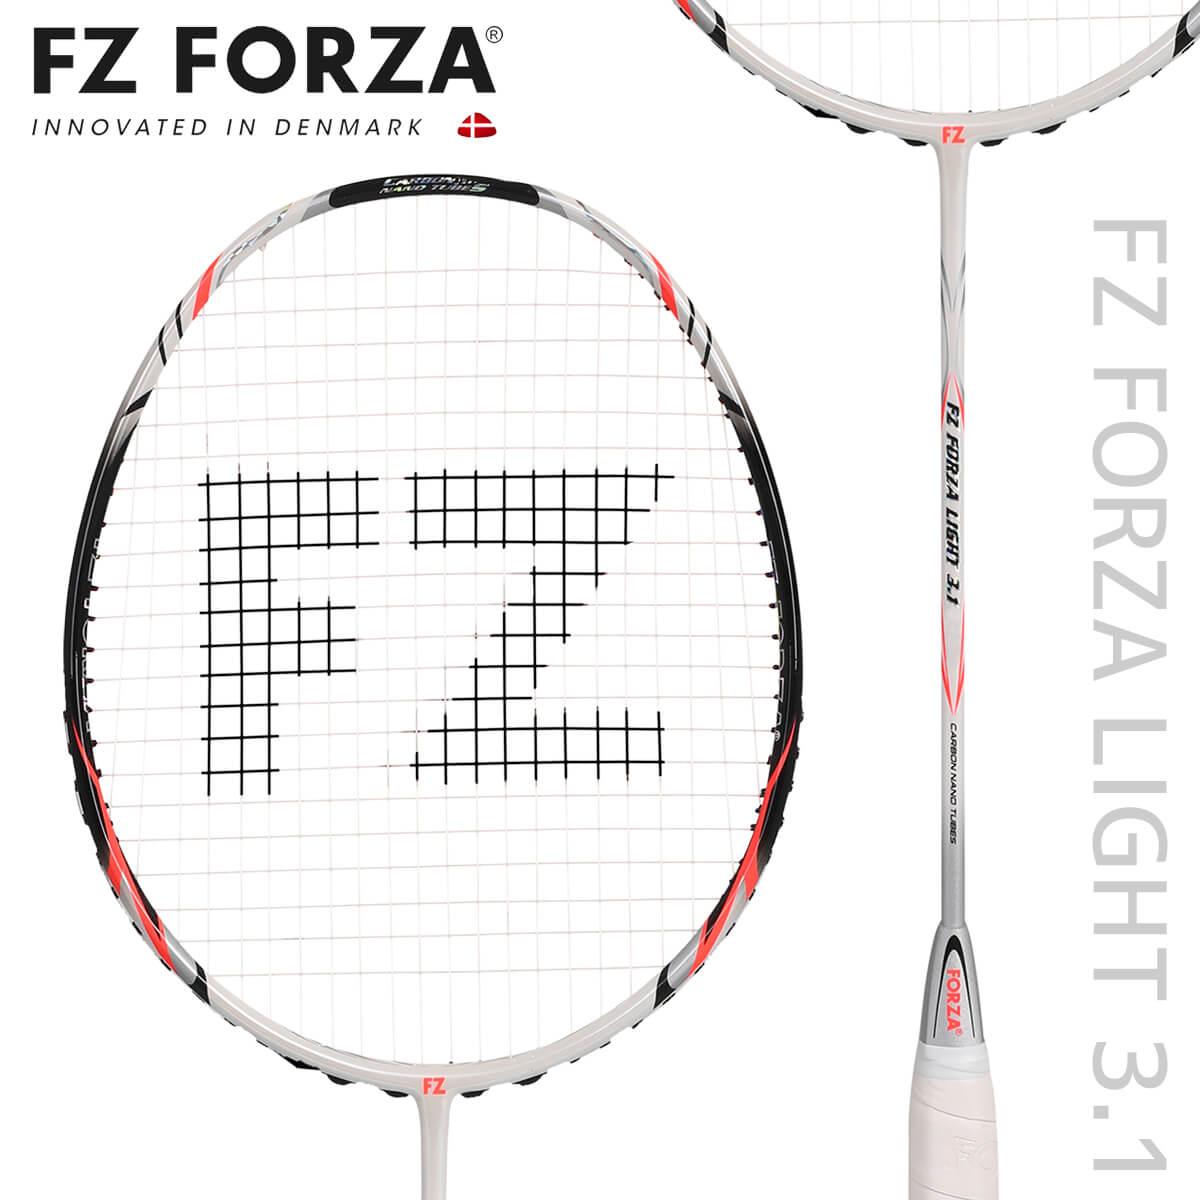 FZ FORZA LIGHT31 LIGHT 3.1 バドミントンラケット フォーザ【日本バドミントン協会審査合格品/オススメガット&ガット張り工賃無料】